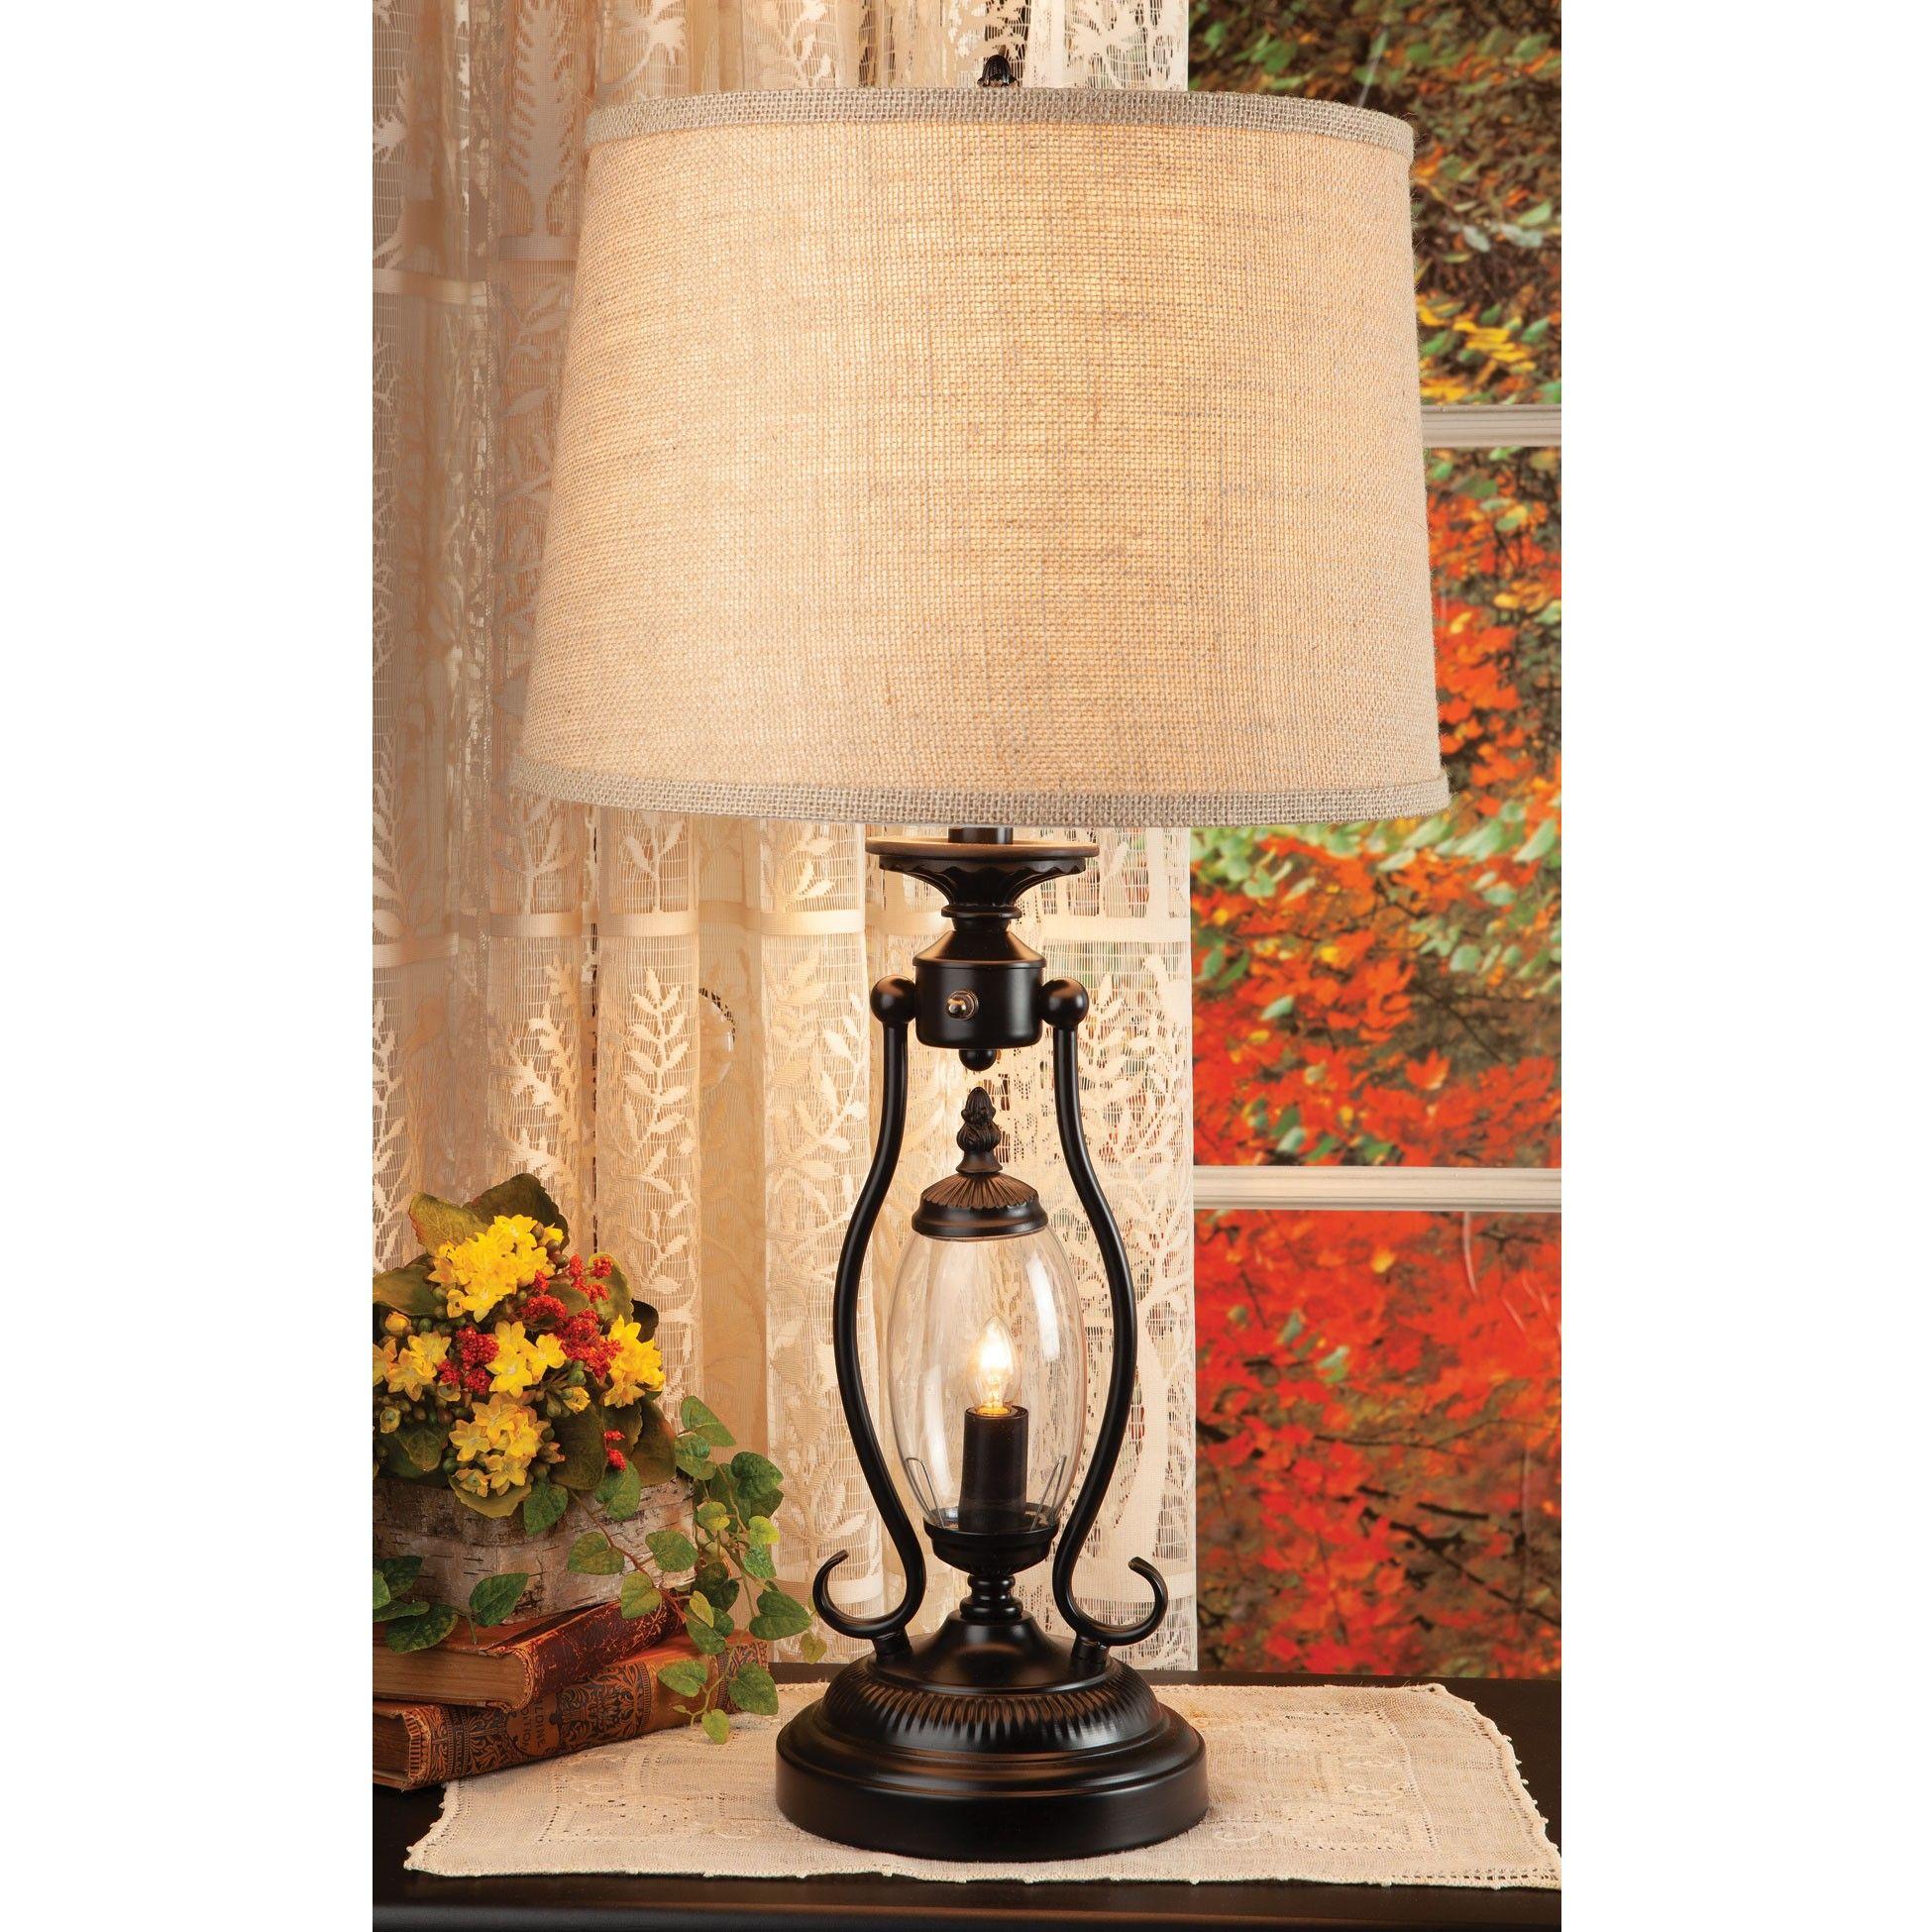 Chadbourne Lamps Lamp Night Table Lamps Adjustable Floor Lamp